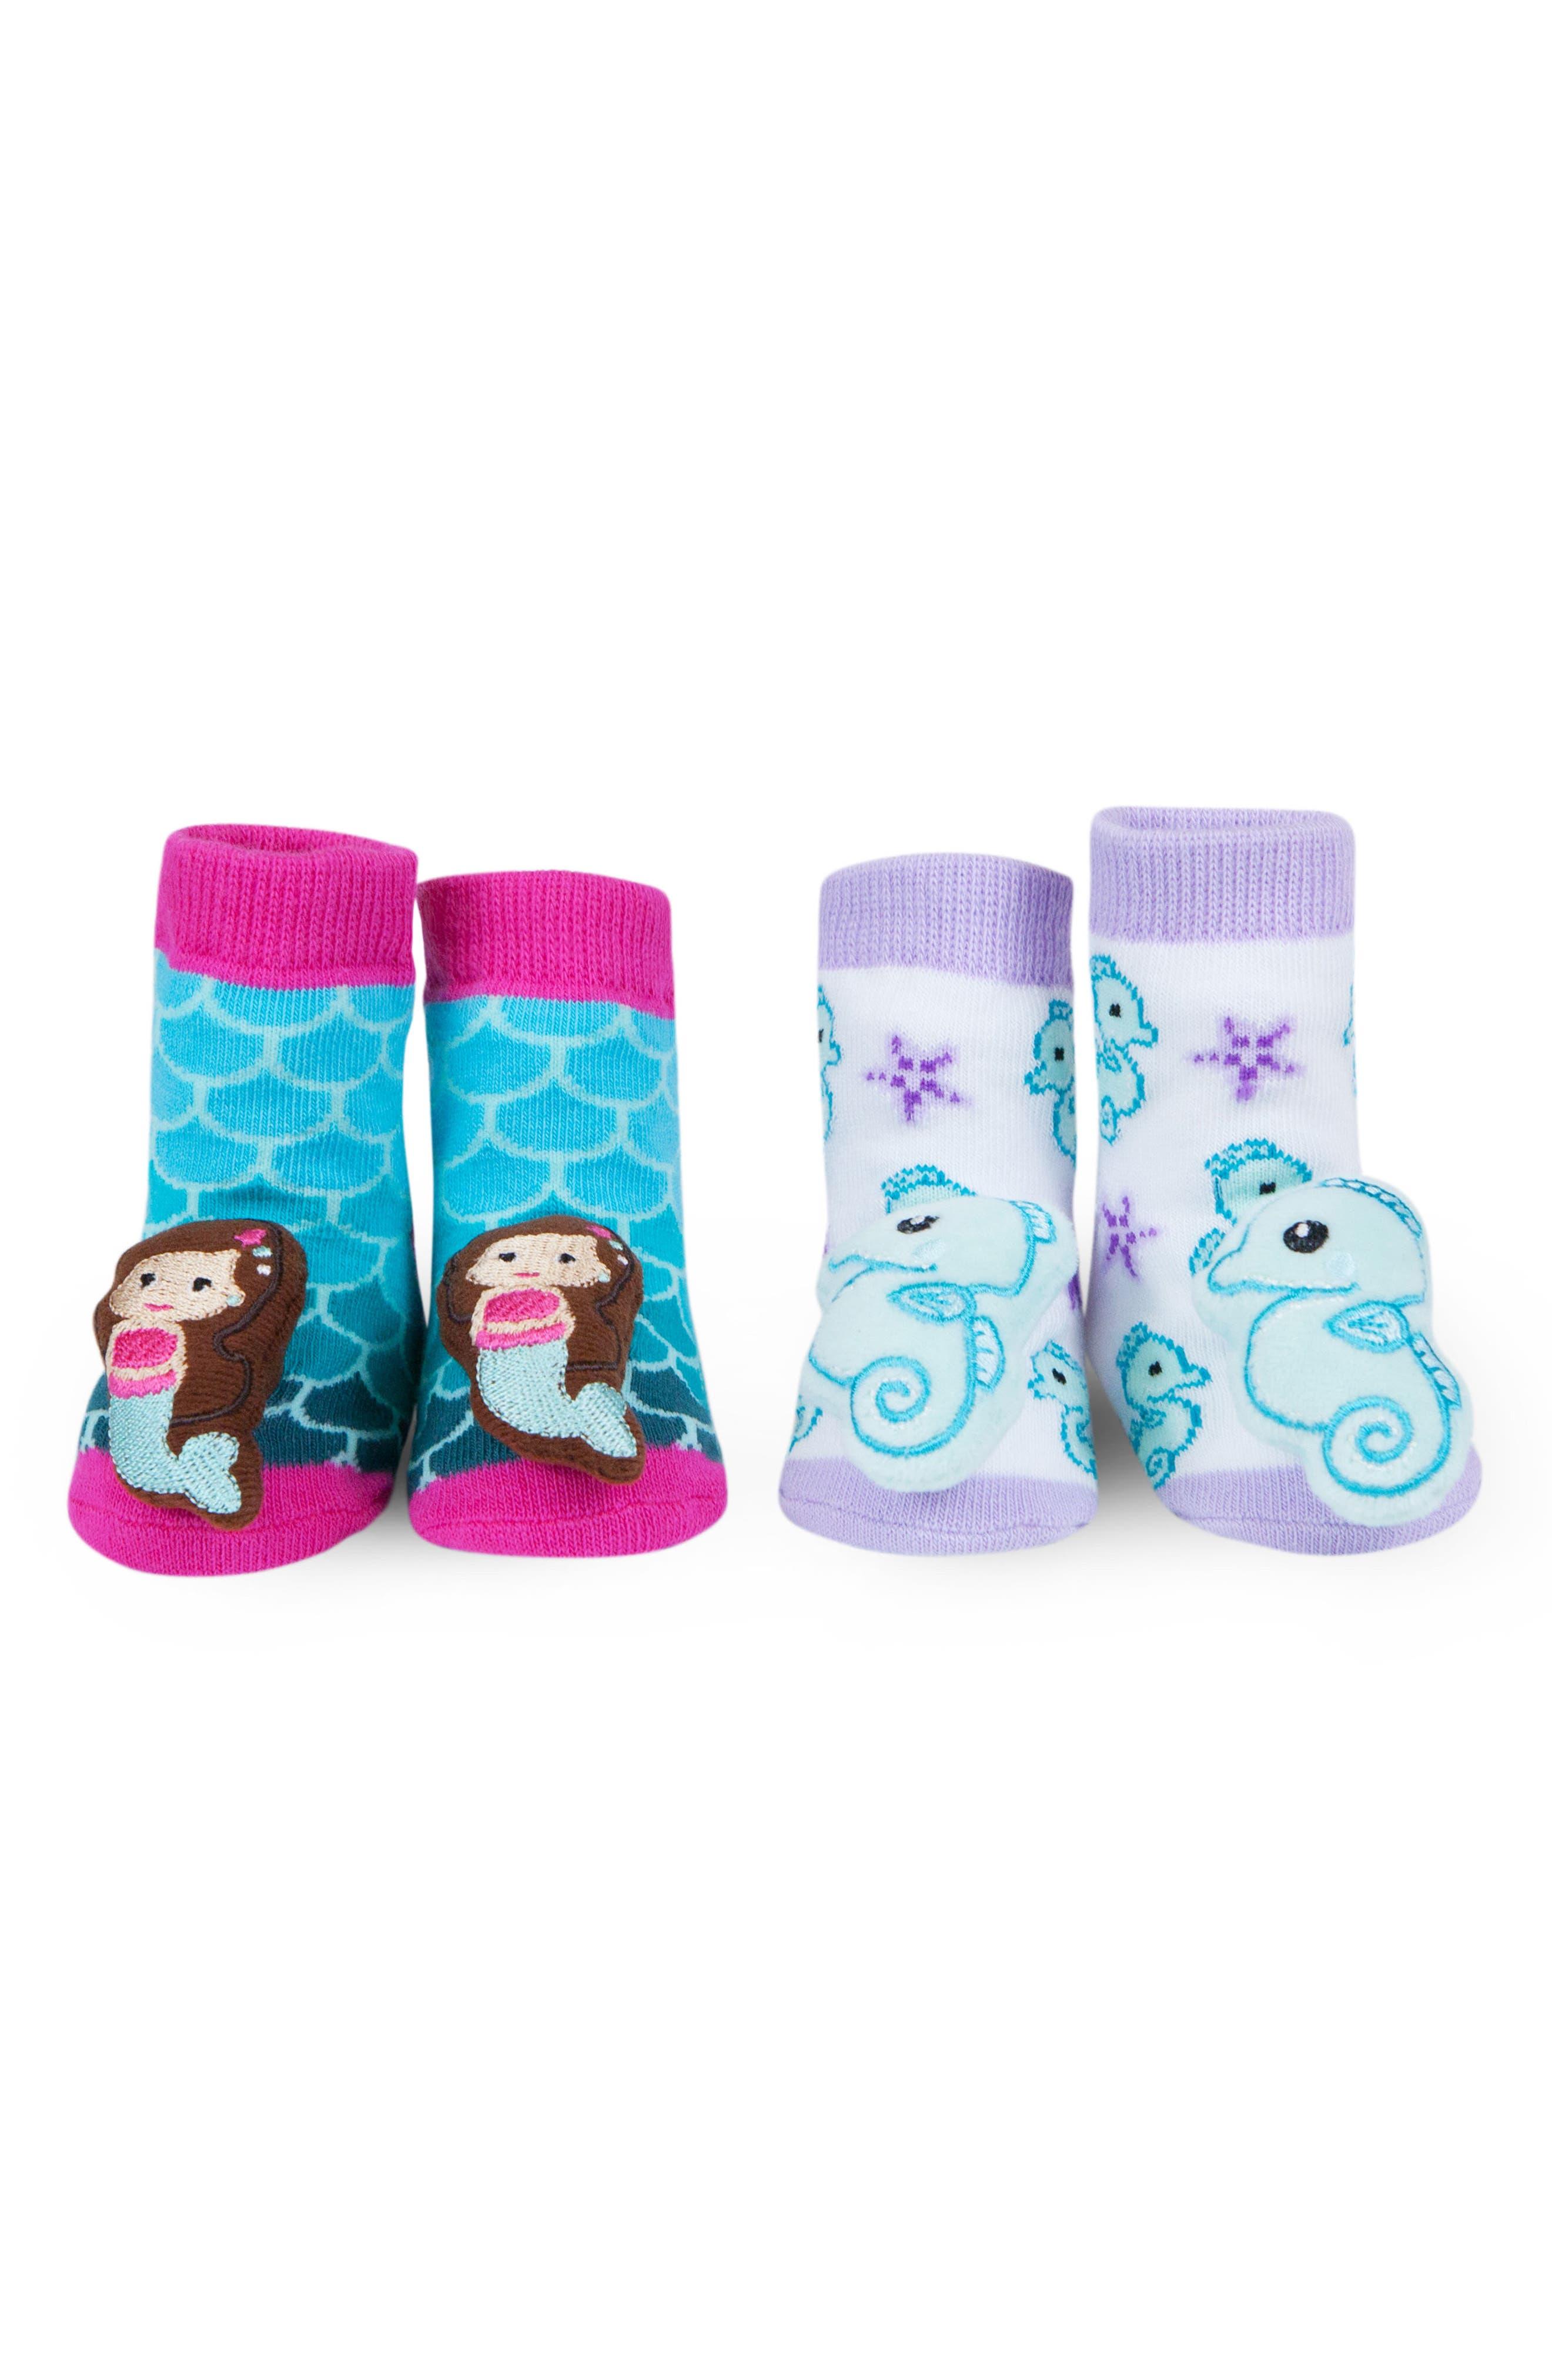 Mermaids 2-Pack Rattle Socks,                         Main,                         color, 650